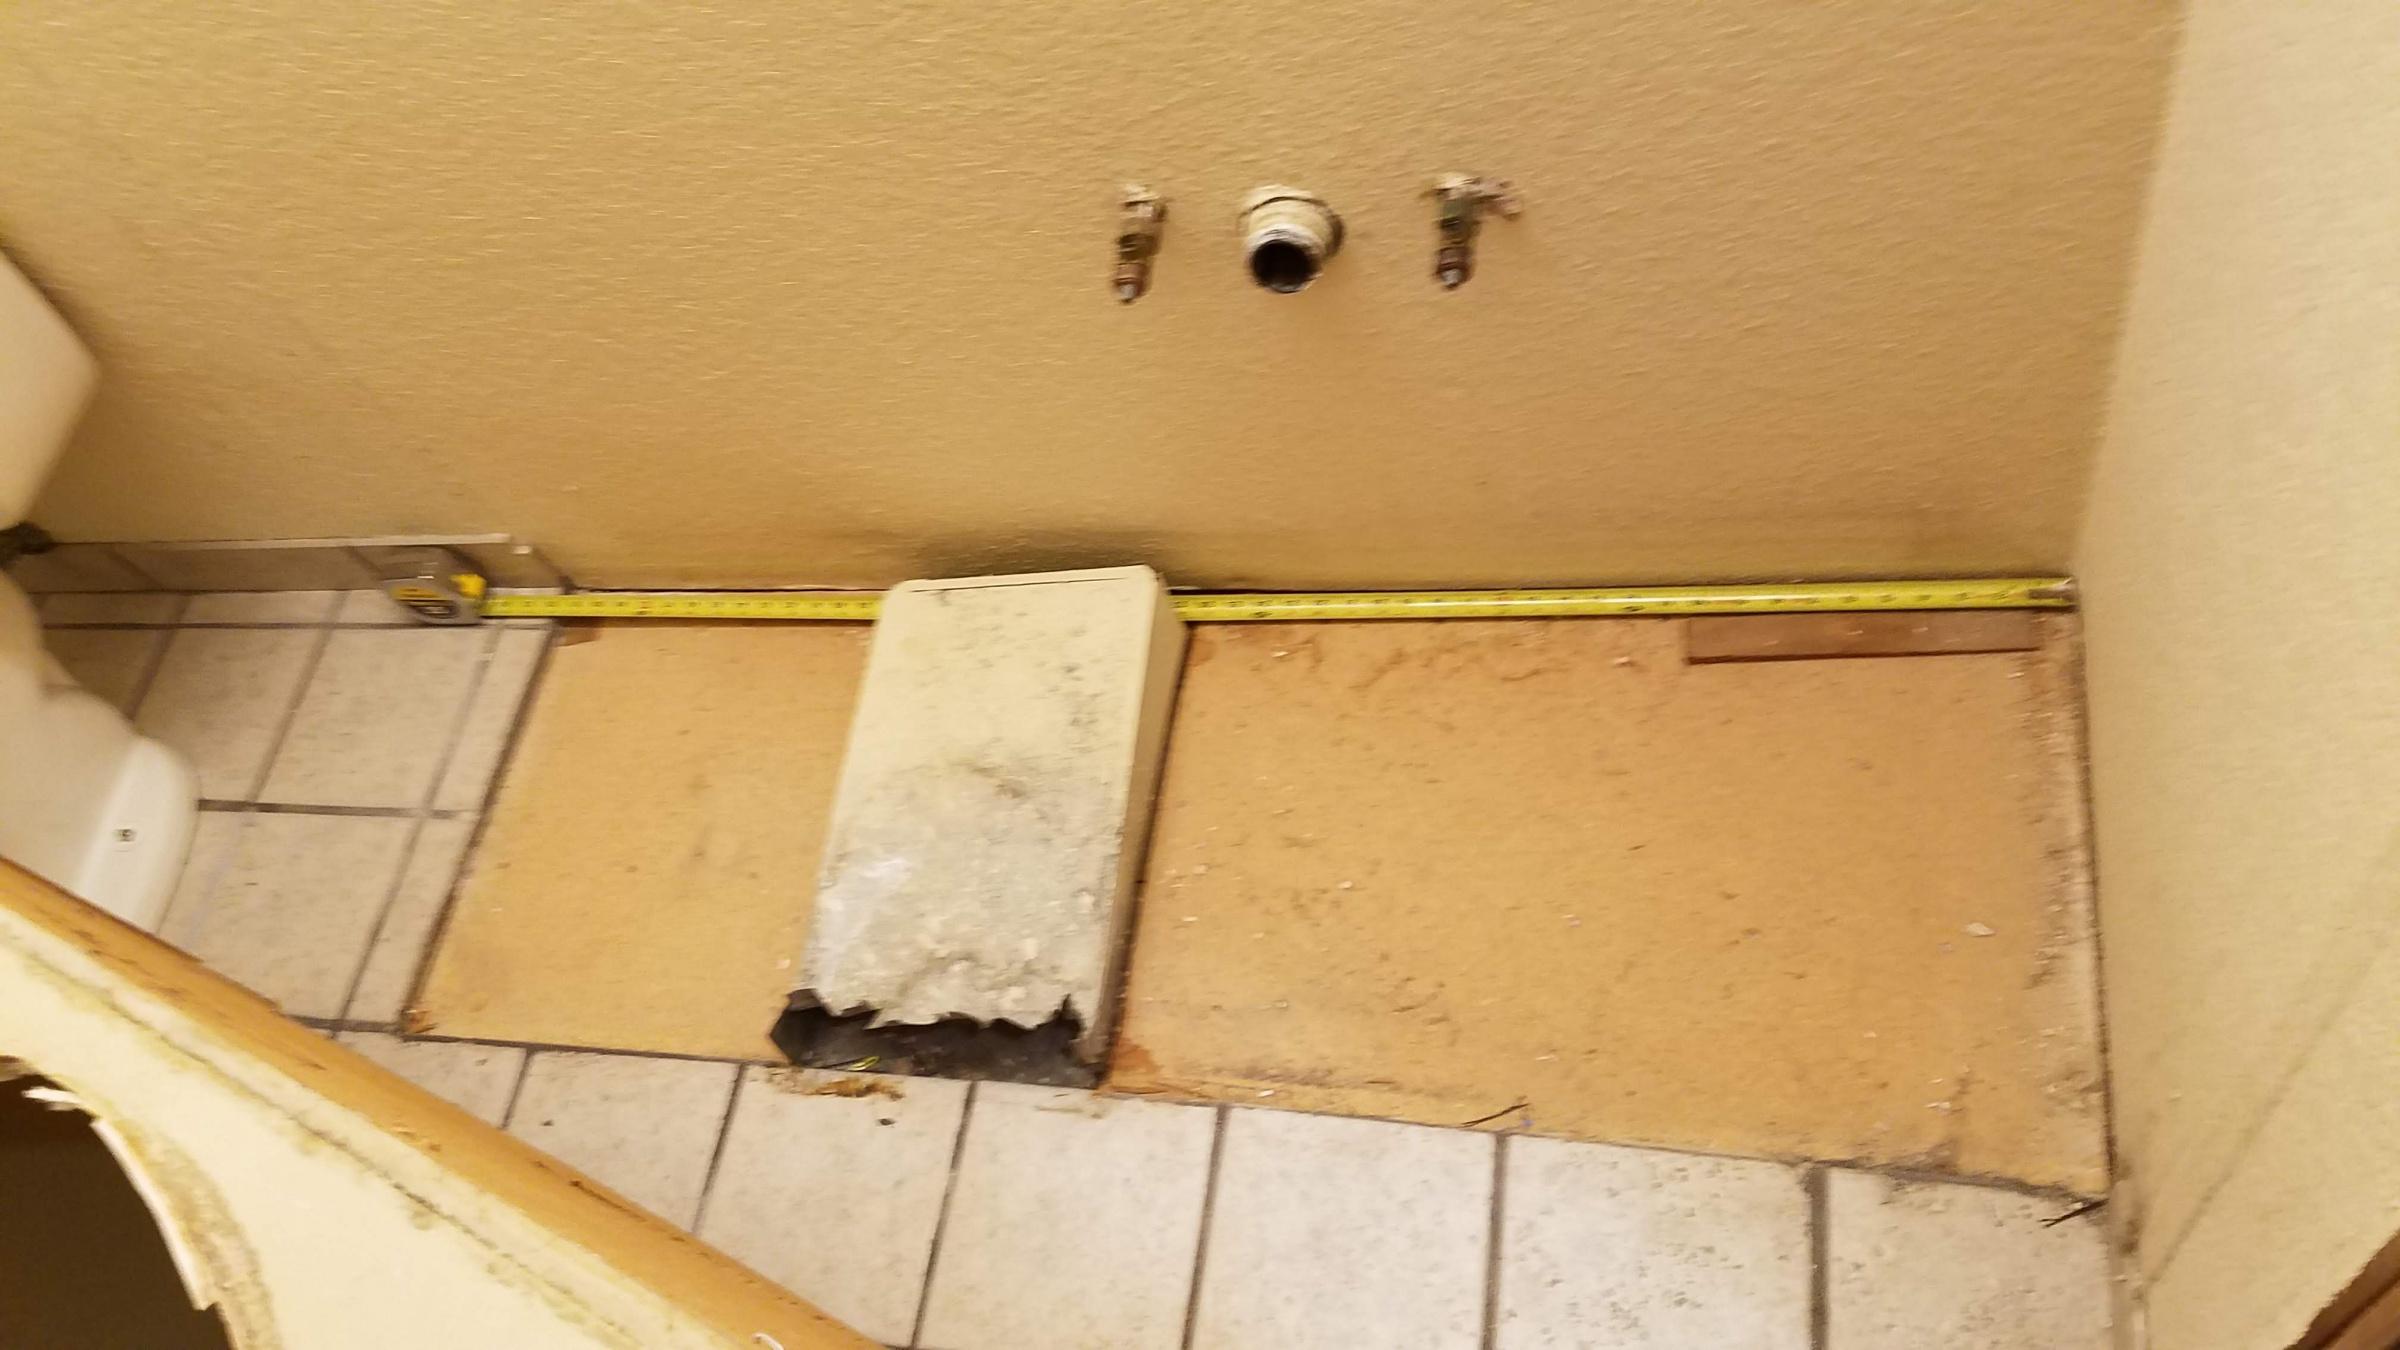 How do I replace existing bathroom vanity?-20181030_184702.jpg